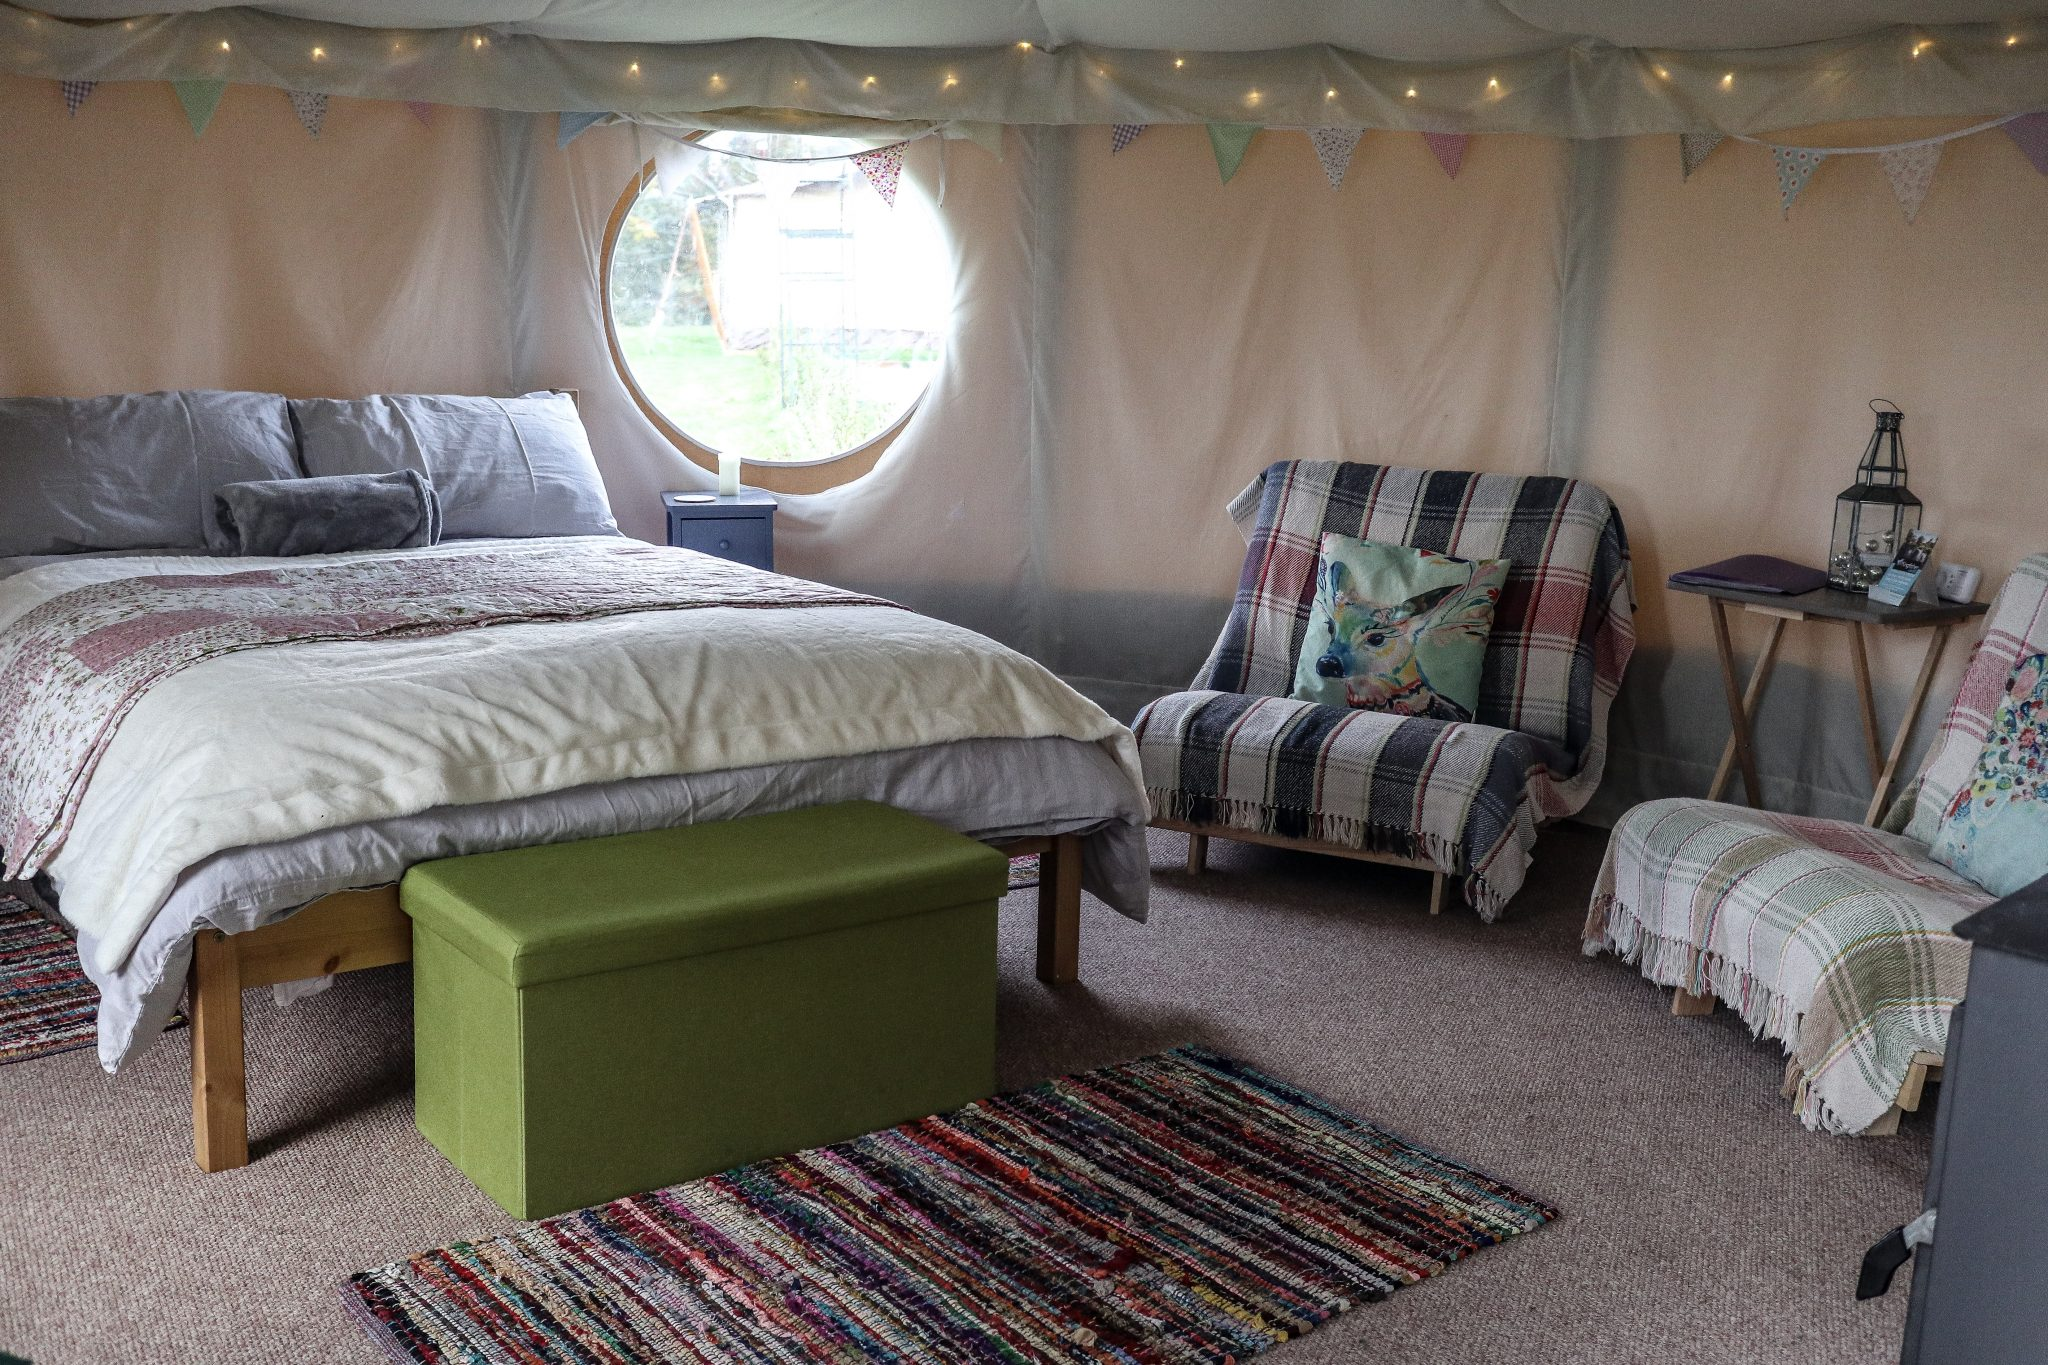 Inside Yurts at Kingfisher Lakes Glamping Site